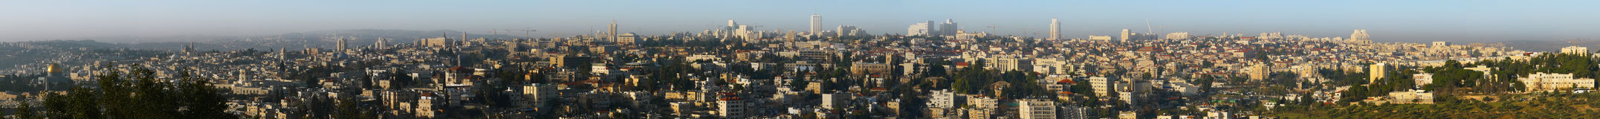 Panorama Jerusalem Israel imagens de stock royalty free